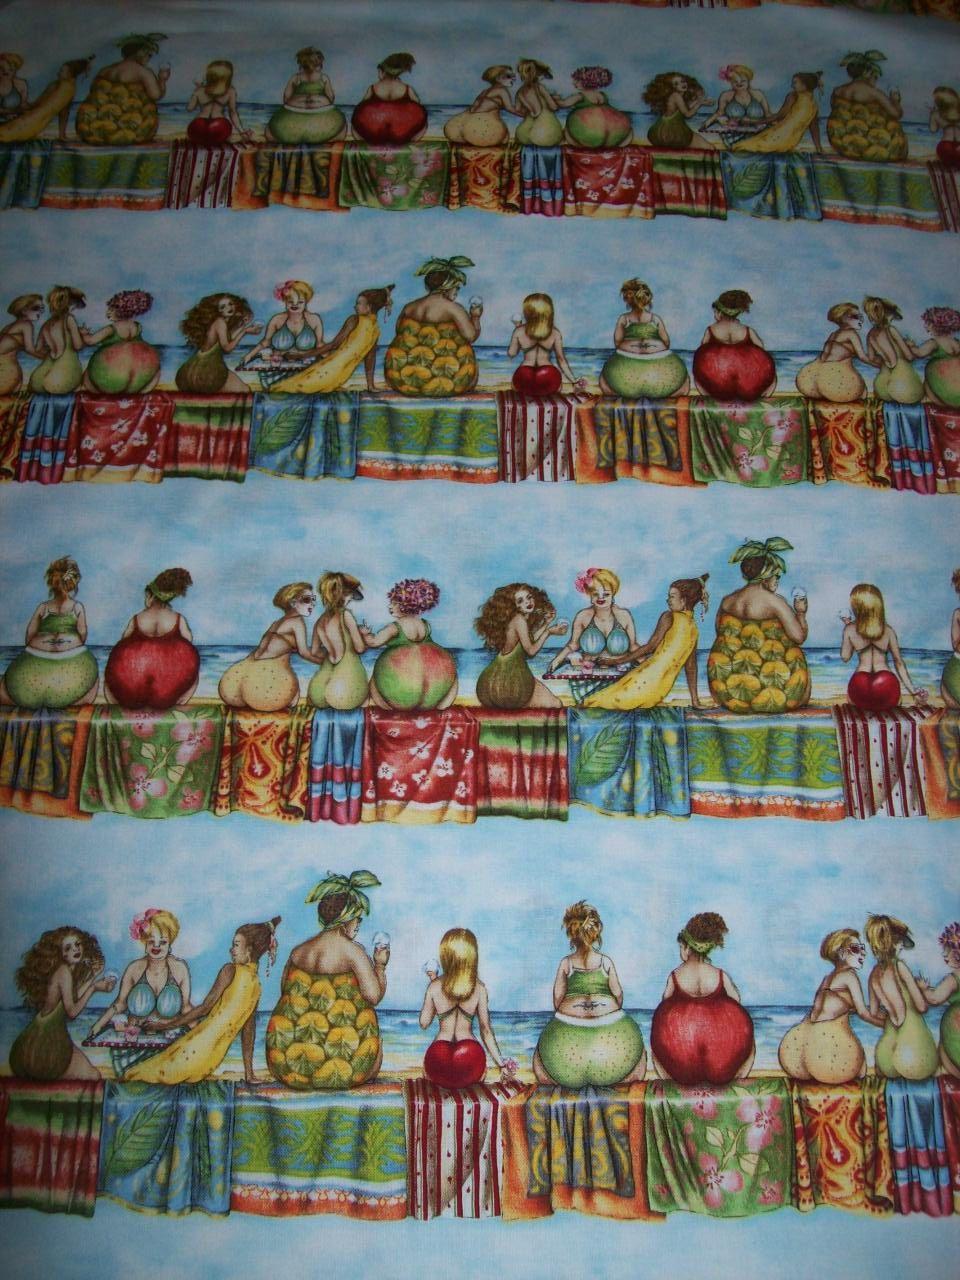 Per Yard fabric called fruit ladies by Elizabeth\'s Studio Beach ...